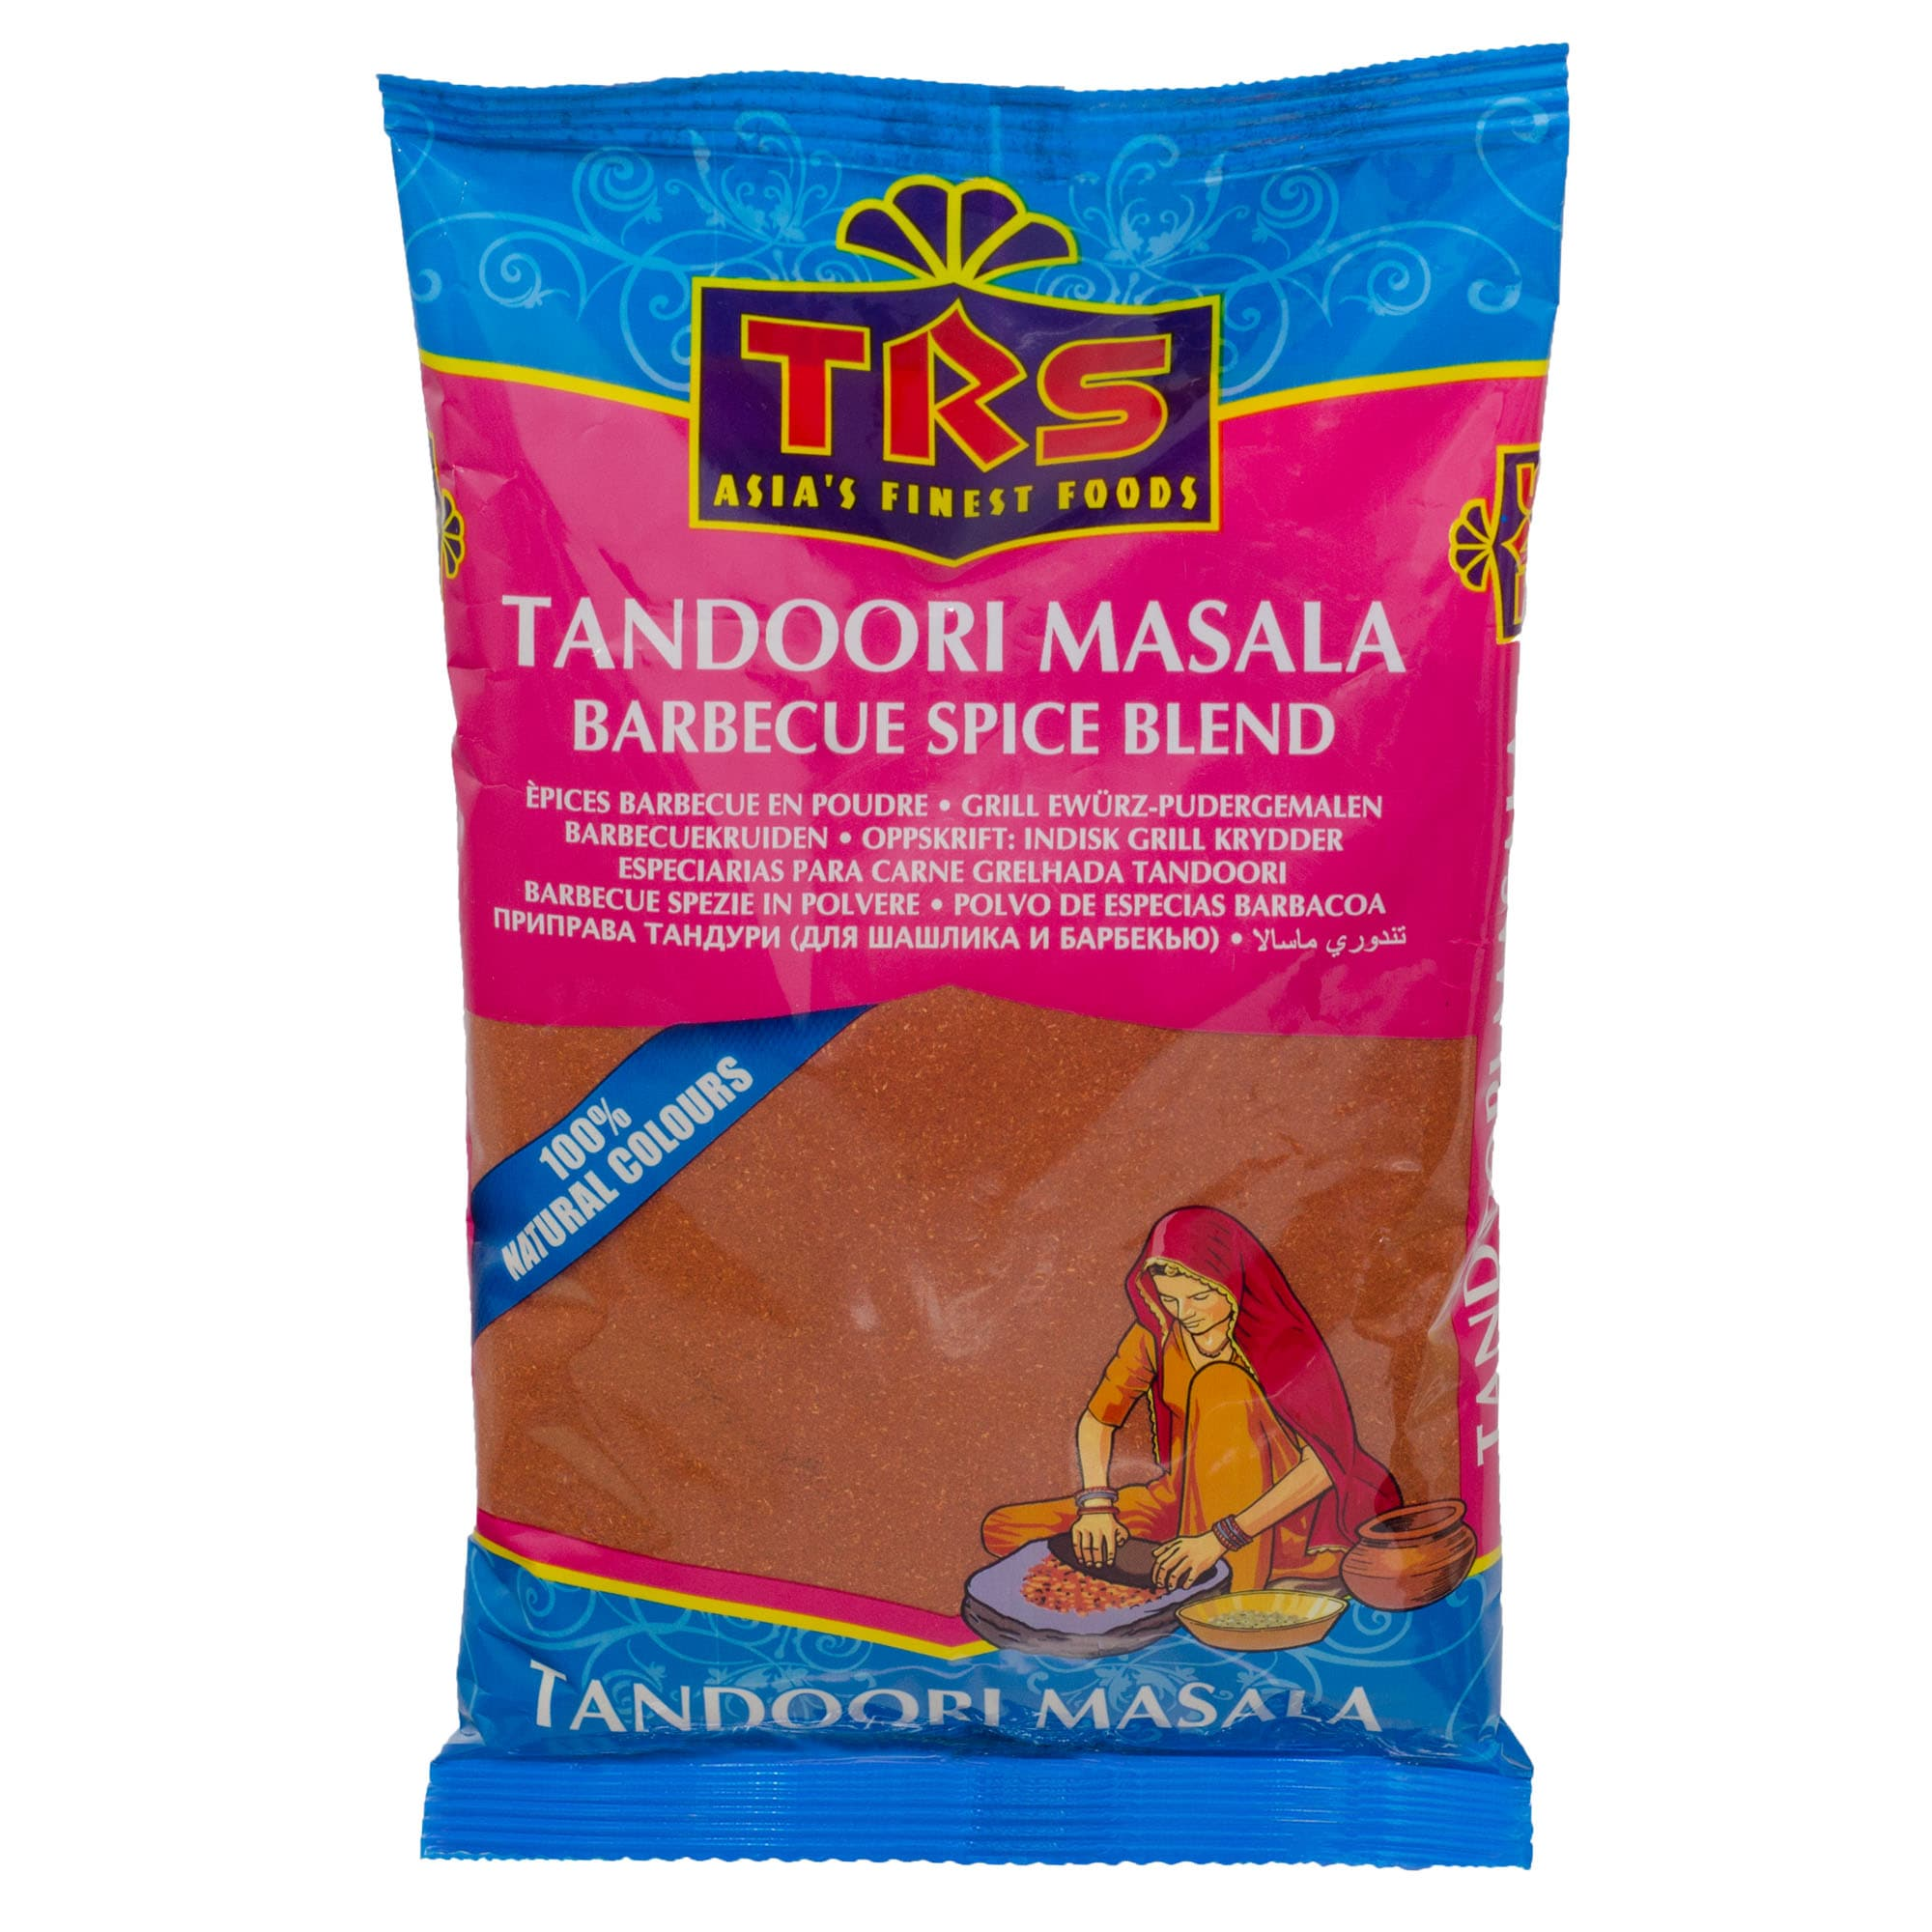 TRS Tandoori Masala Grillgewürzmischung 400g